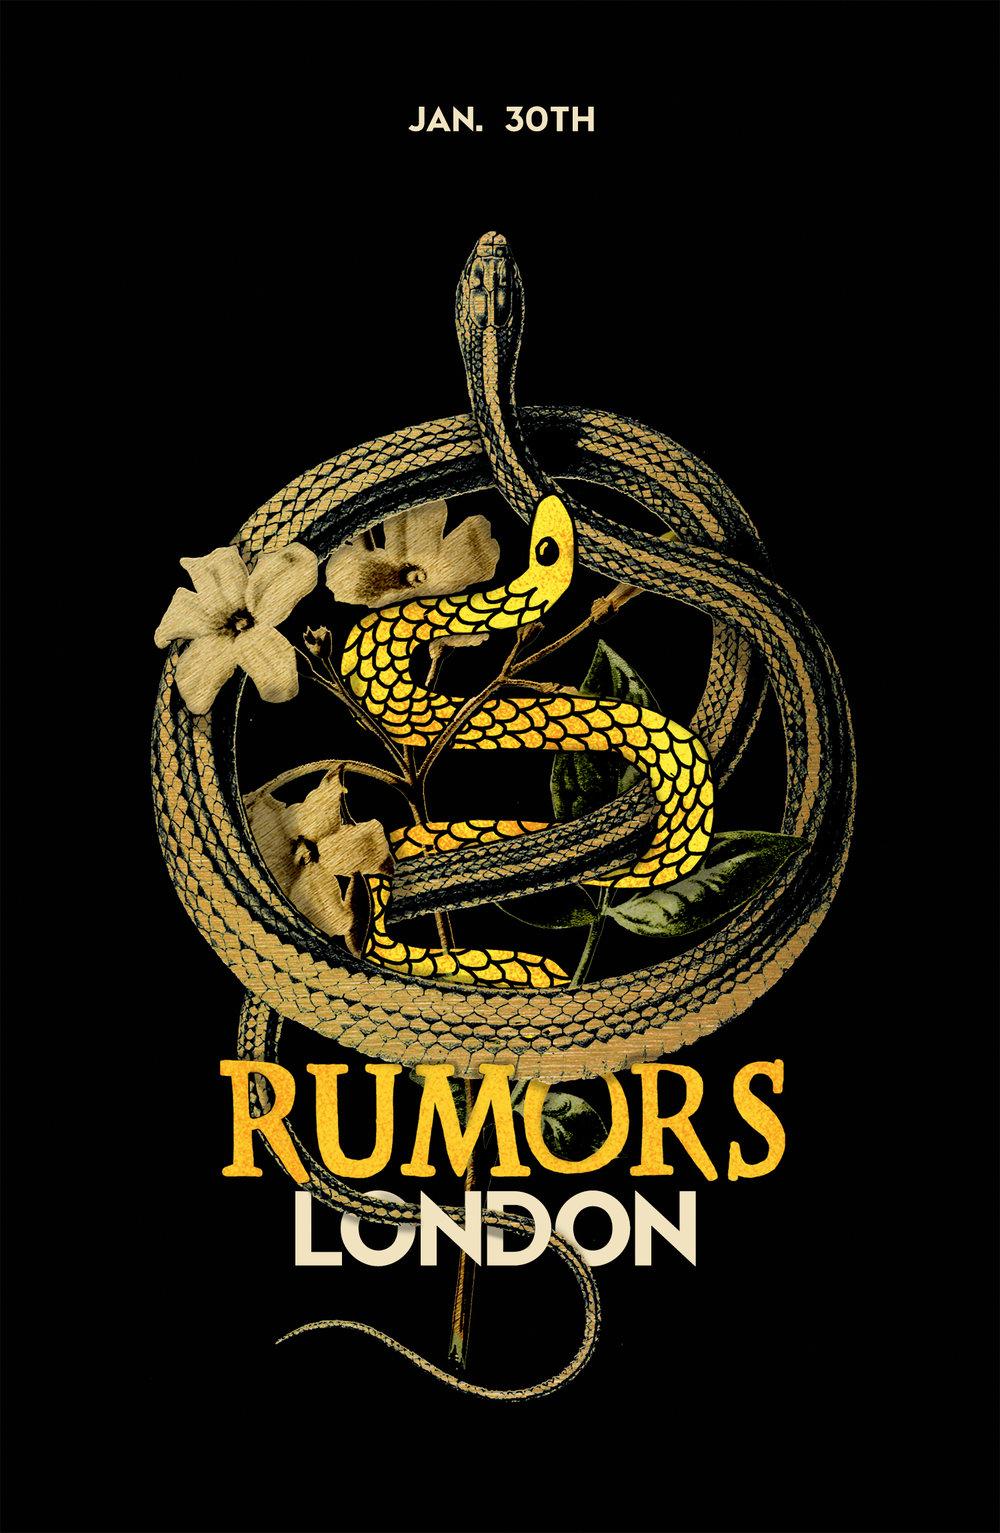 Rumors-LONDON-11x17.jpg